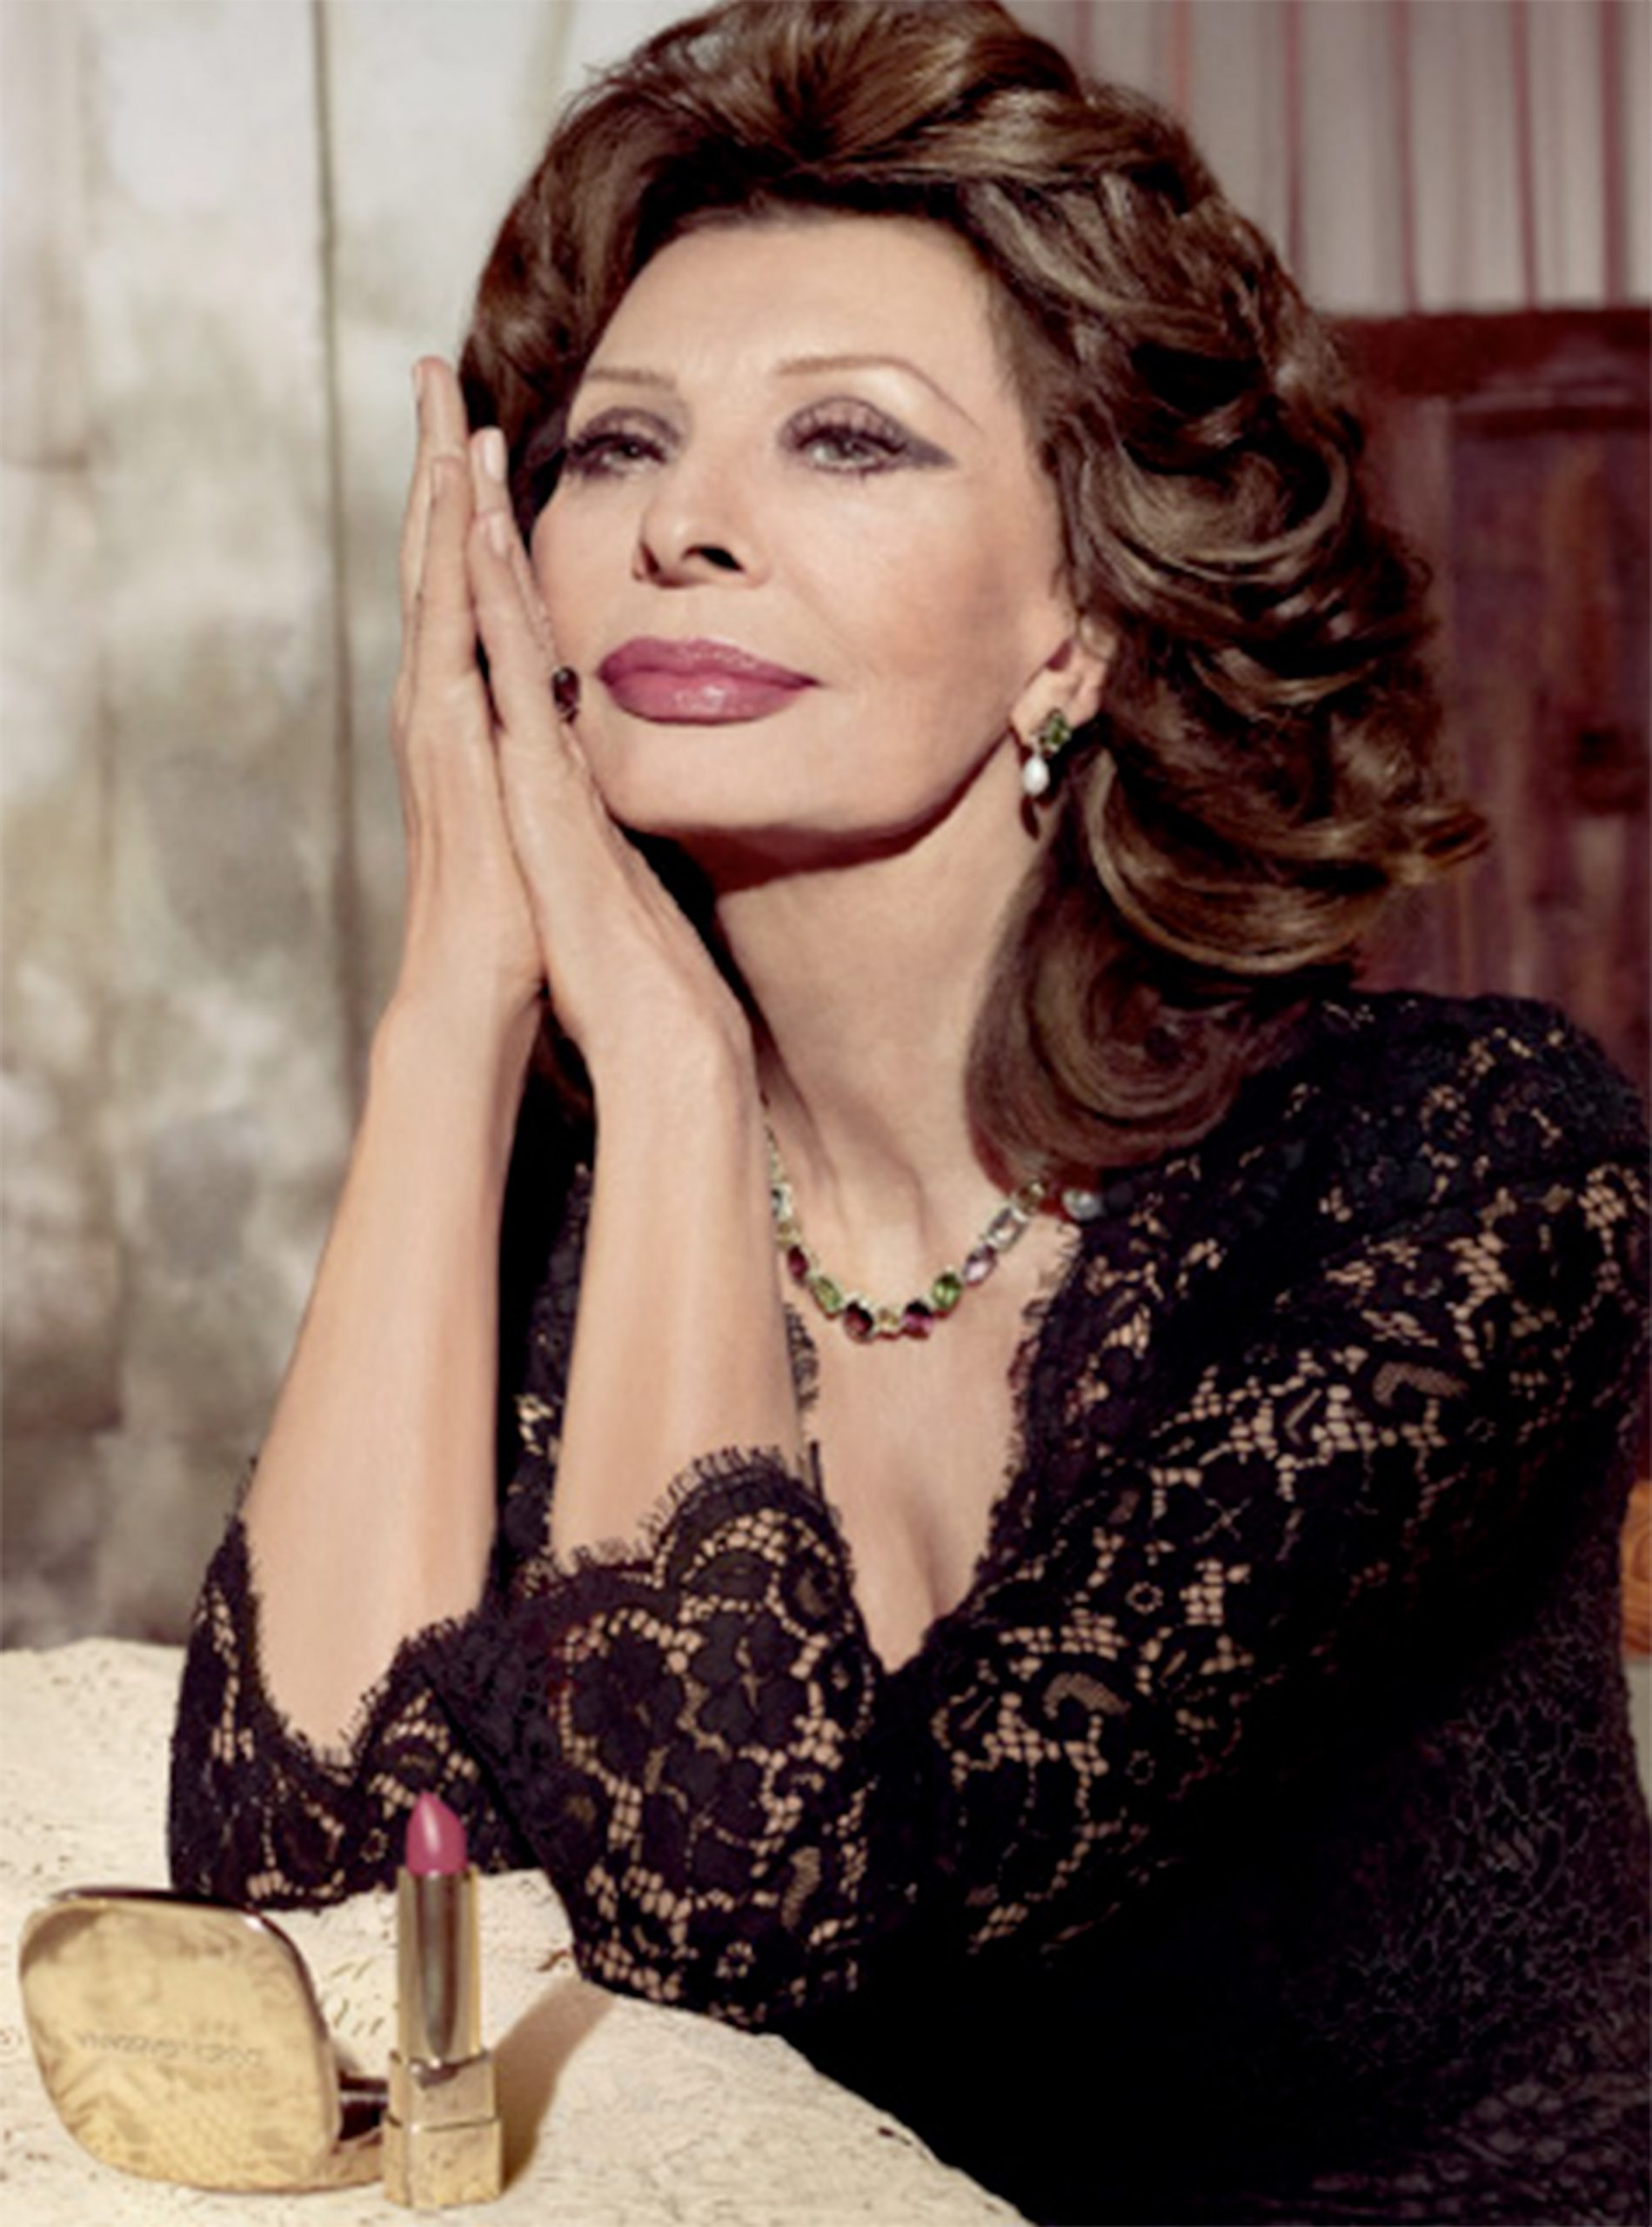 Sophia Loren In Dolce & Gabbana Lipstick Ad